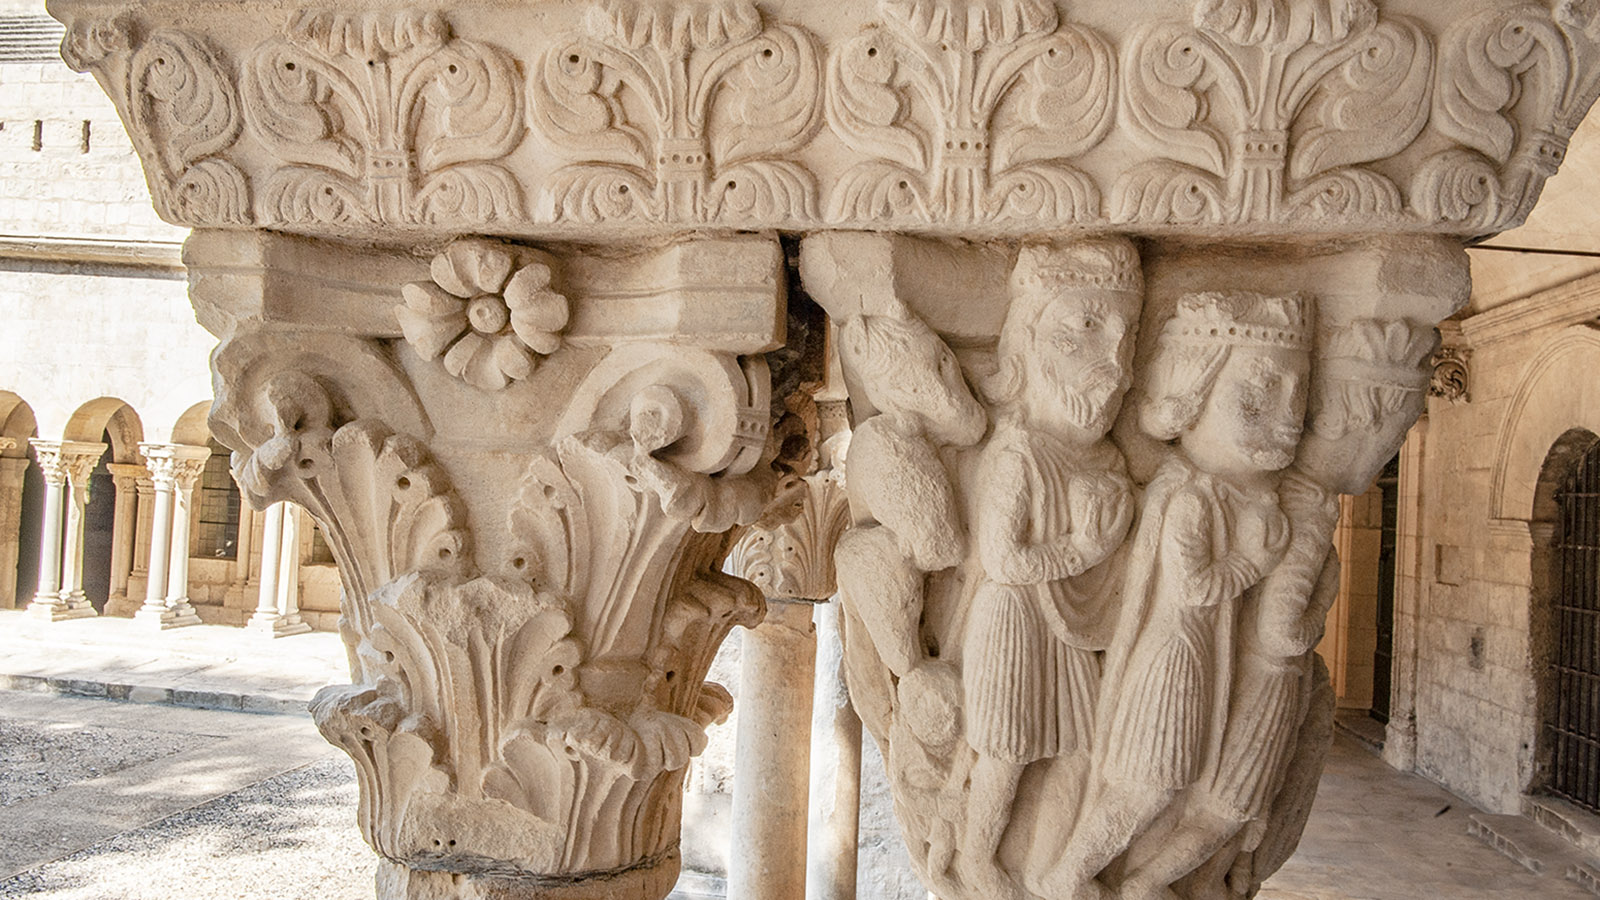 Arles: Steinmetzkunst im Kreuzgang von Saint-Trophime. Foto: Hilke Maunder